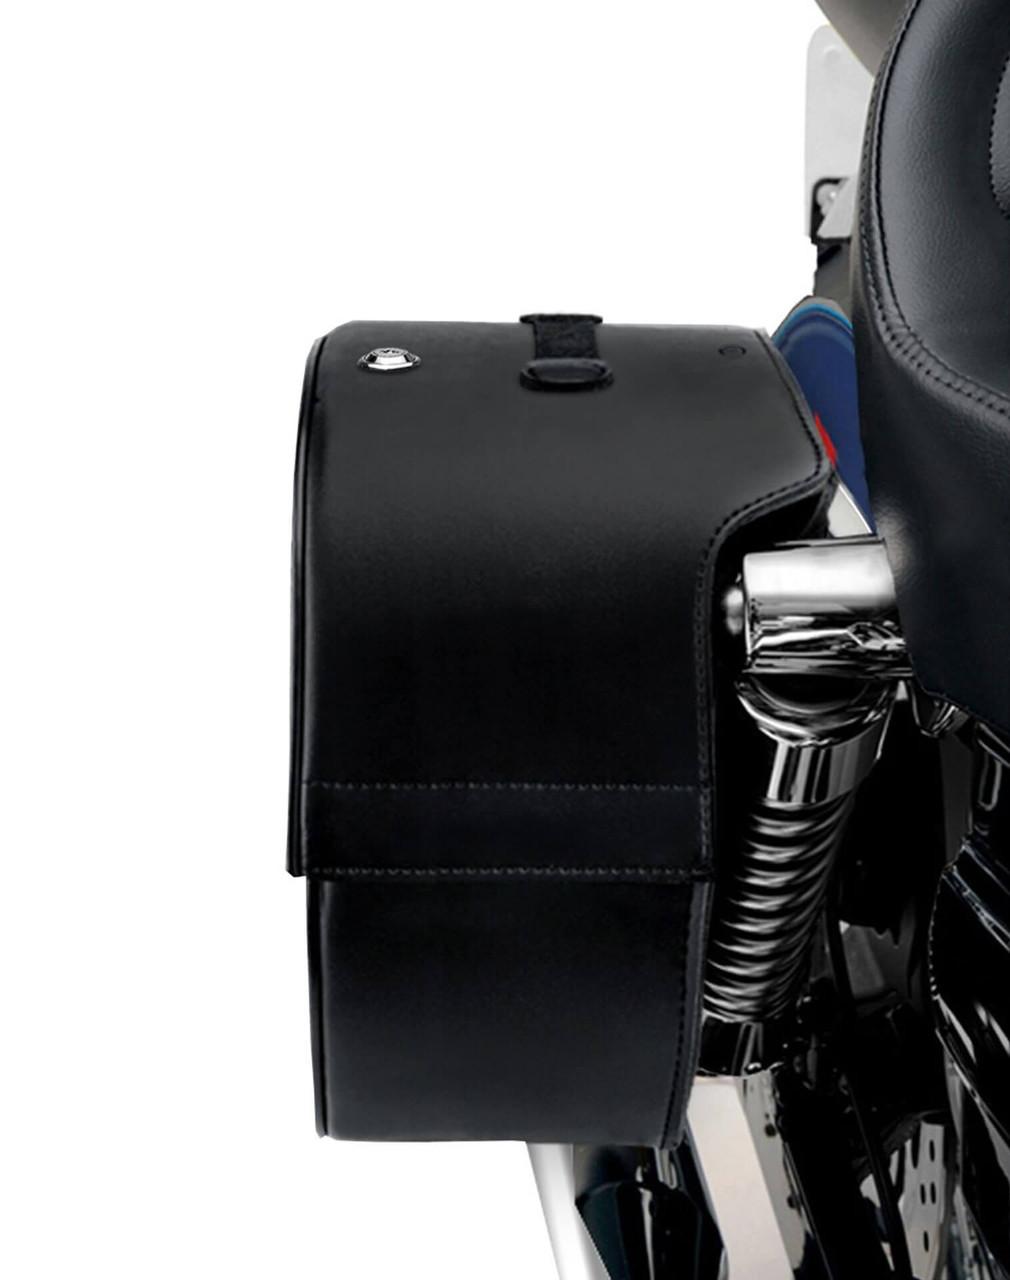 Kawasaki Vulcan 1500 Classic Spear Shock Cutout Large Motorcycle Saddlebags Shock Cutout View